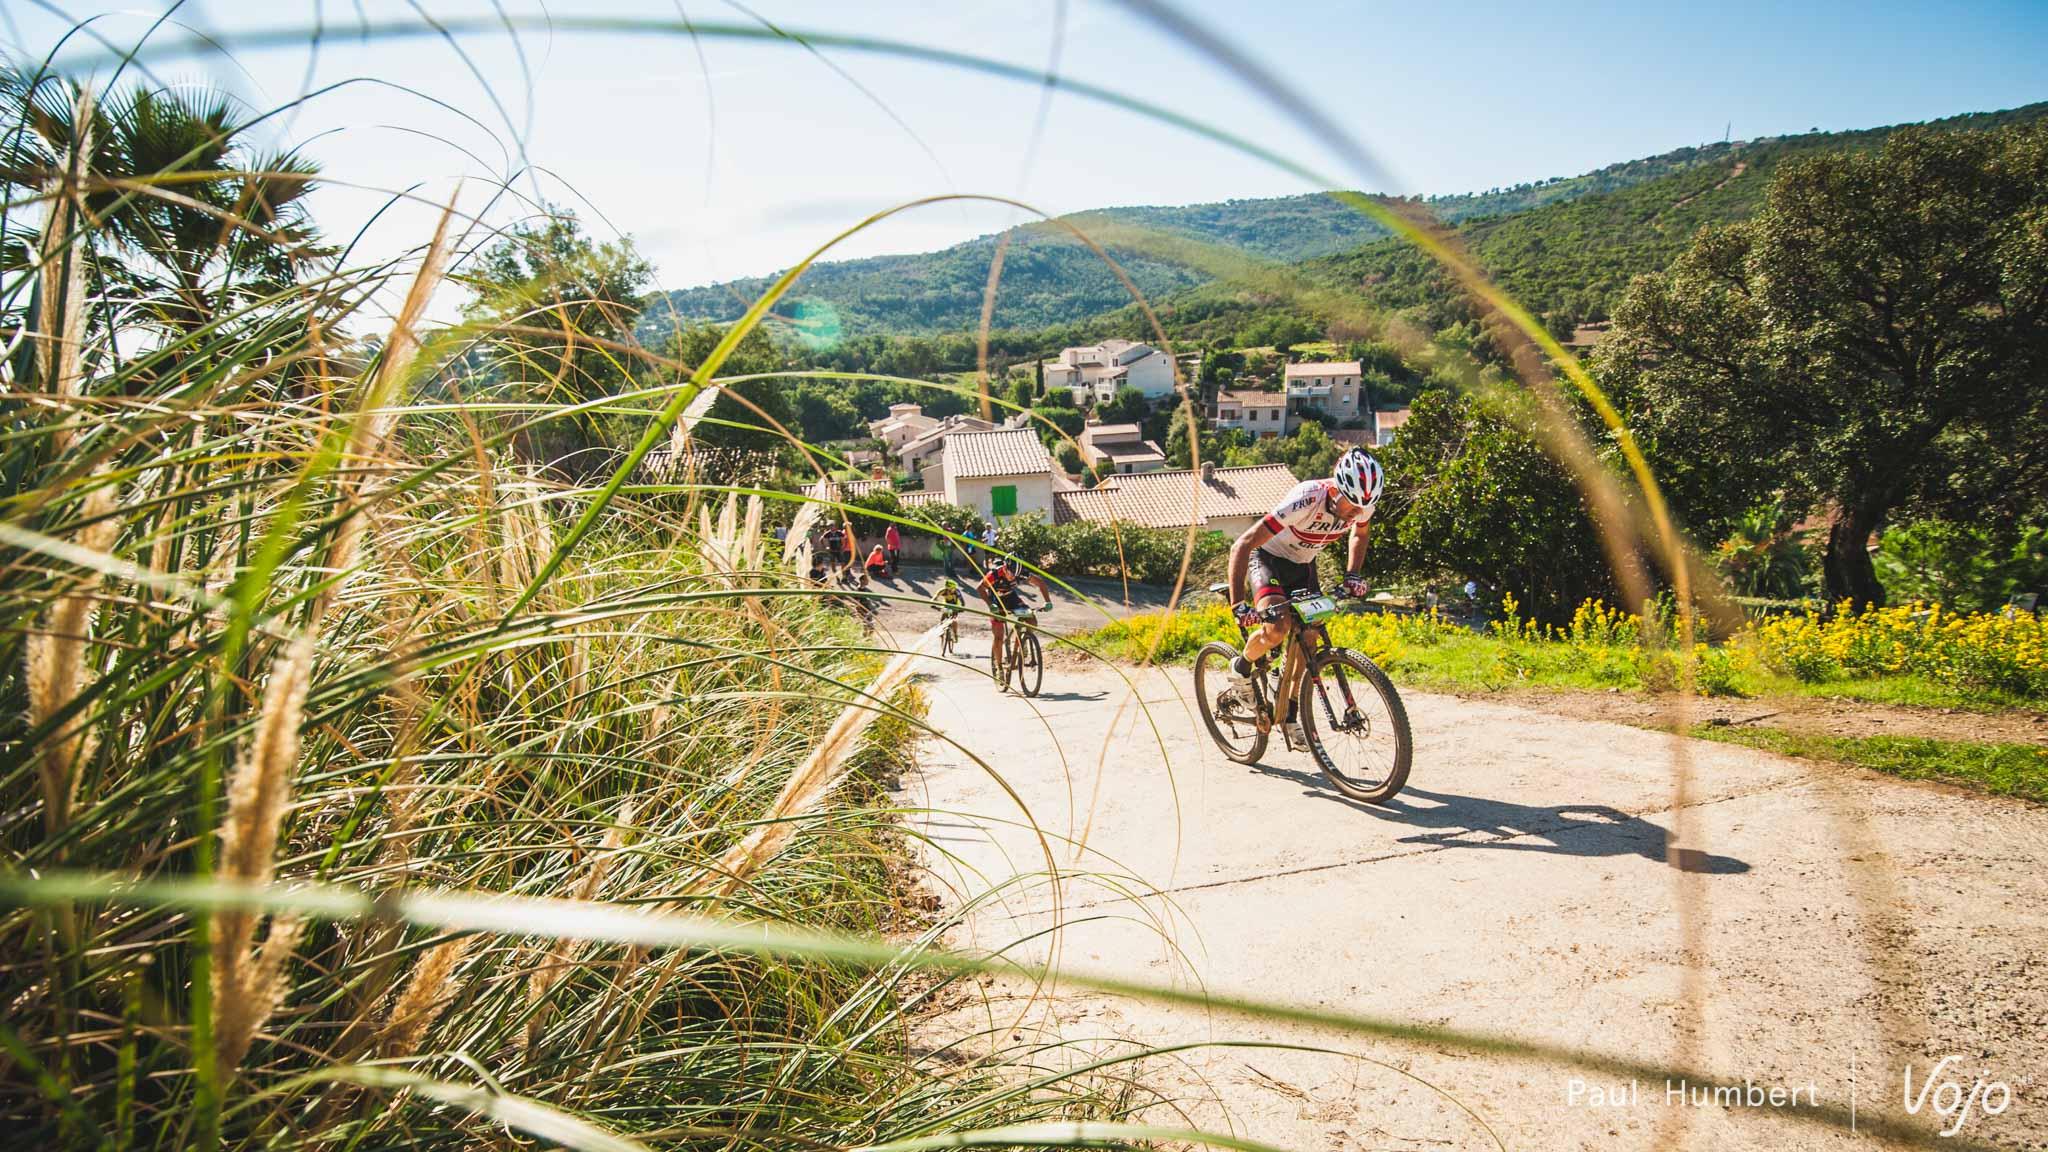 Roc-Azur-2015-Dimanche-Vojo-paul-humbert-66